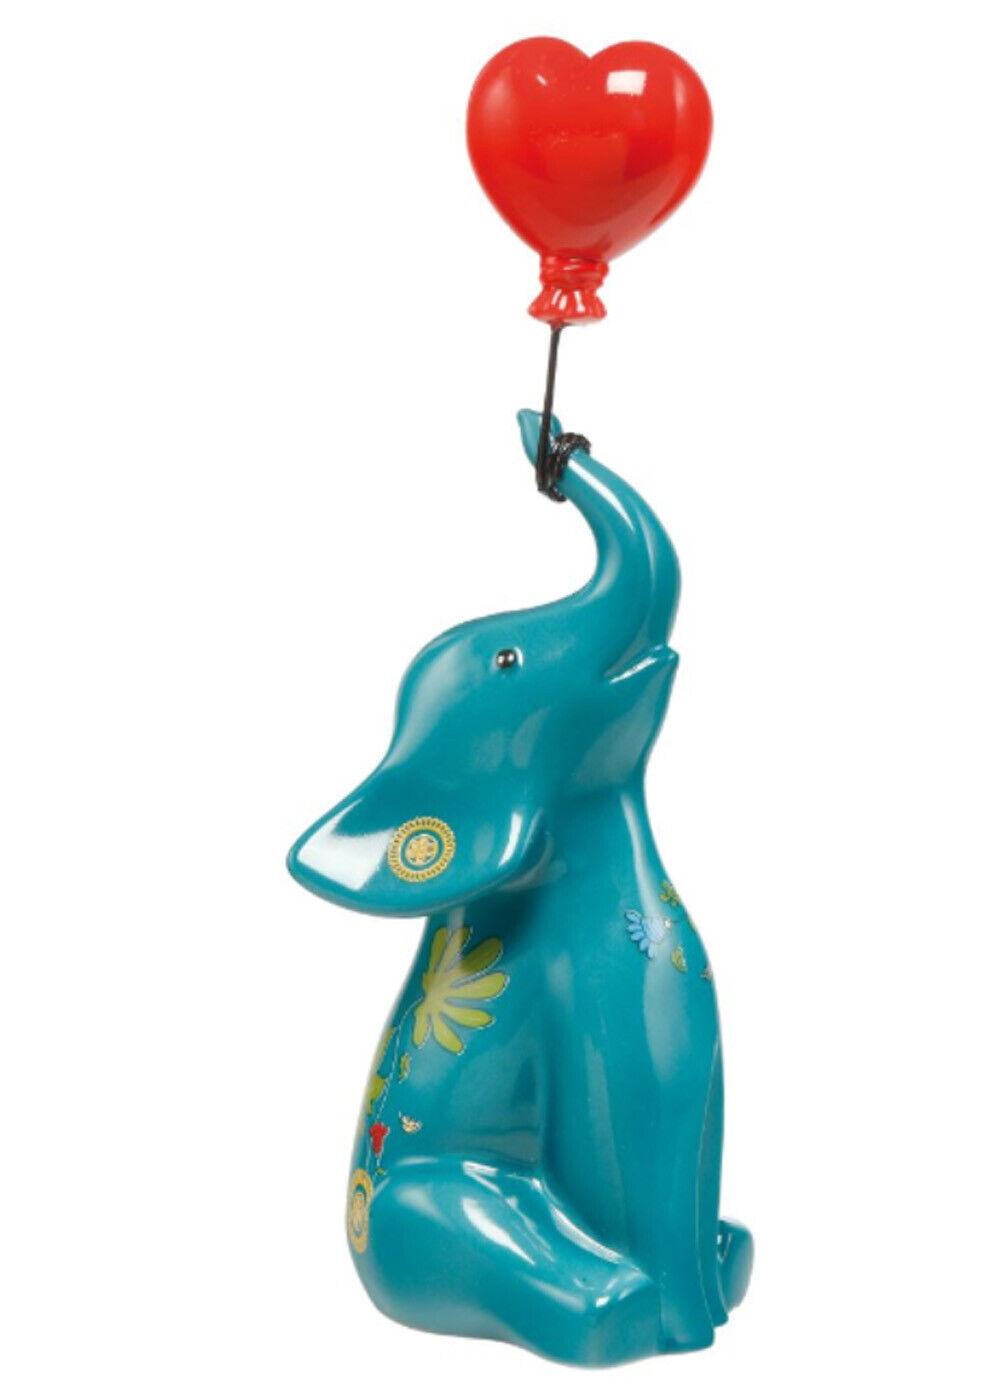 Goebel Elephant de Luxe sagala 20,0 cm novedad 2019 70000541